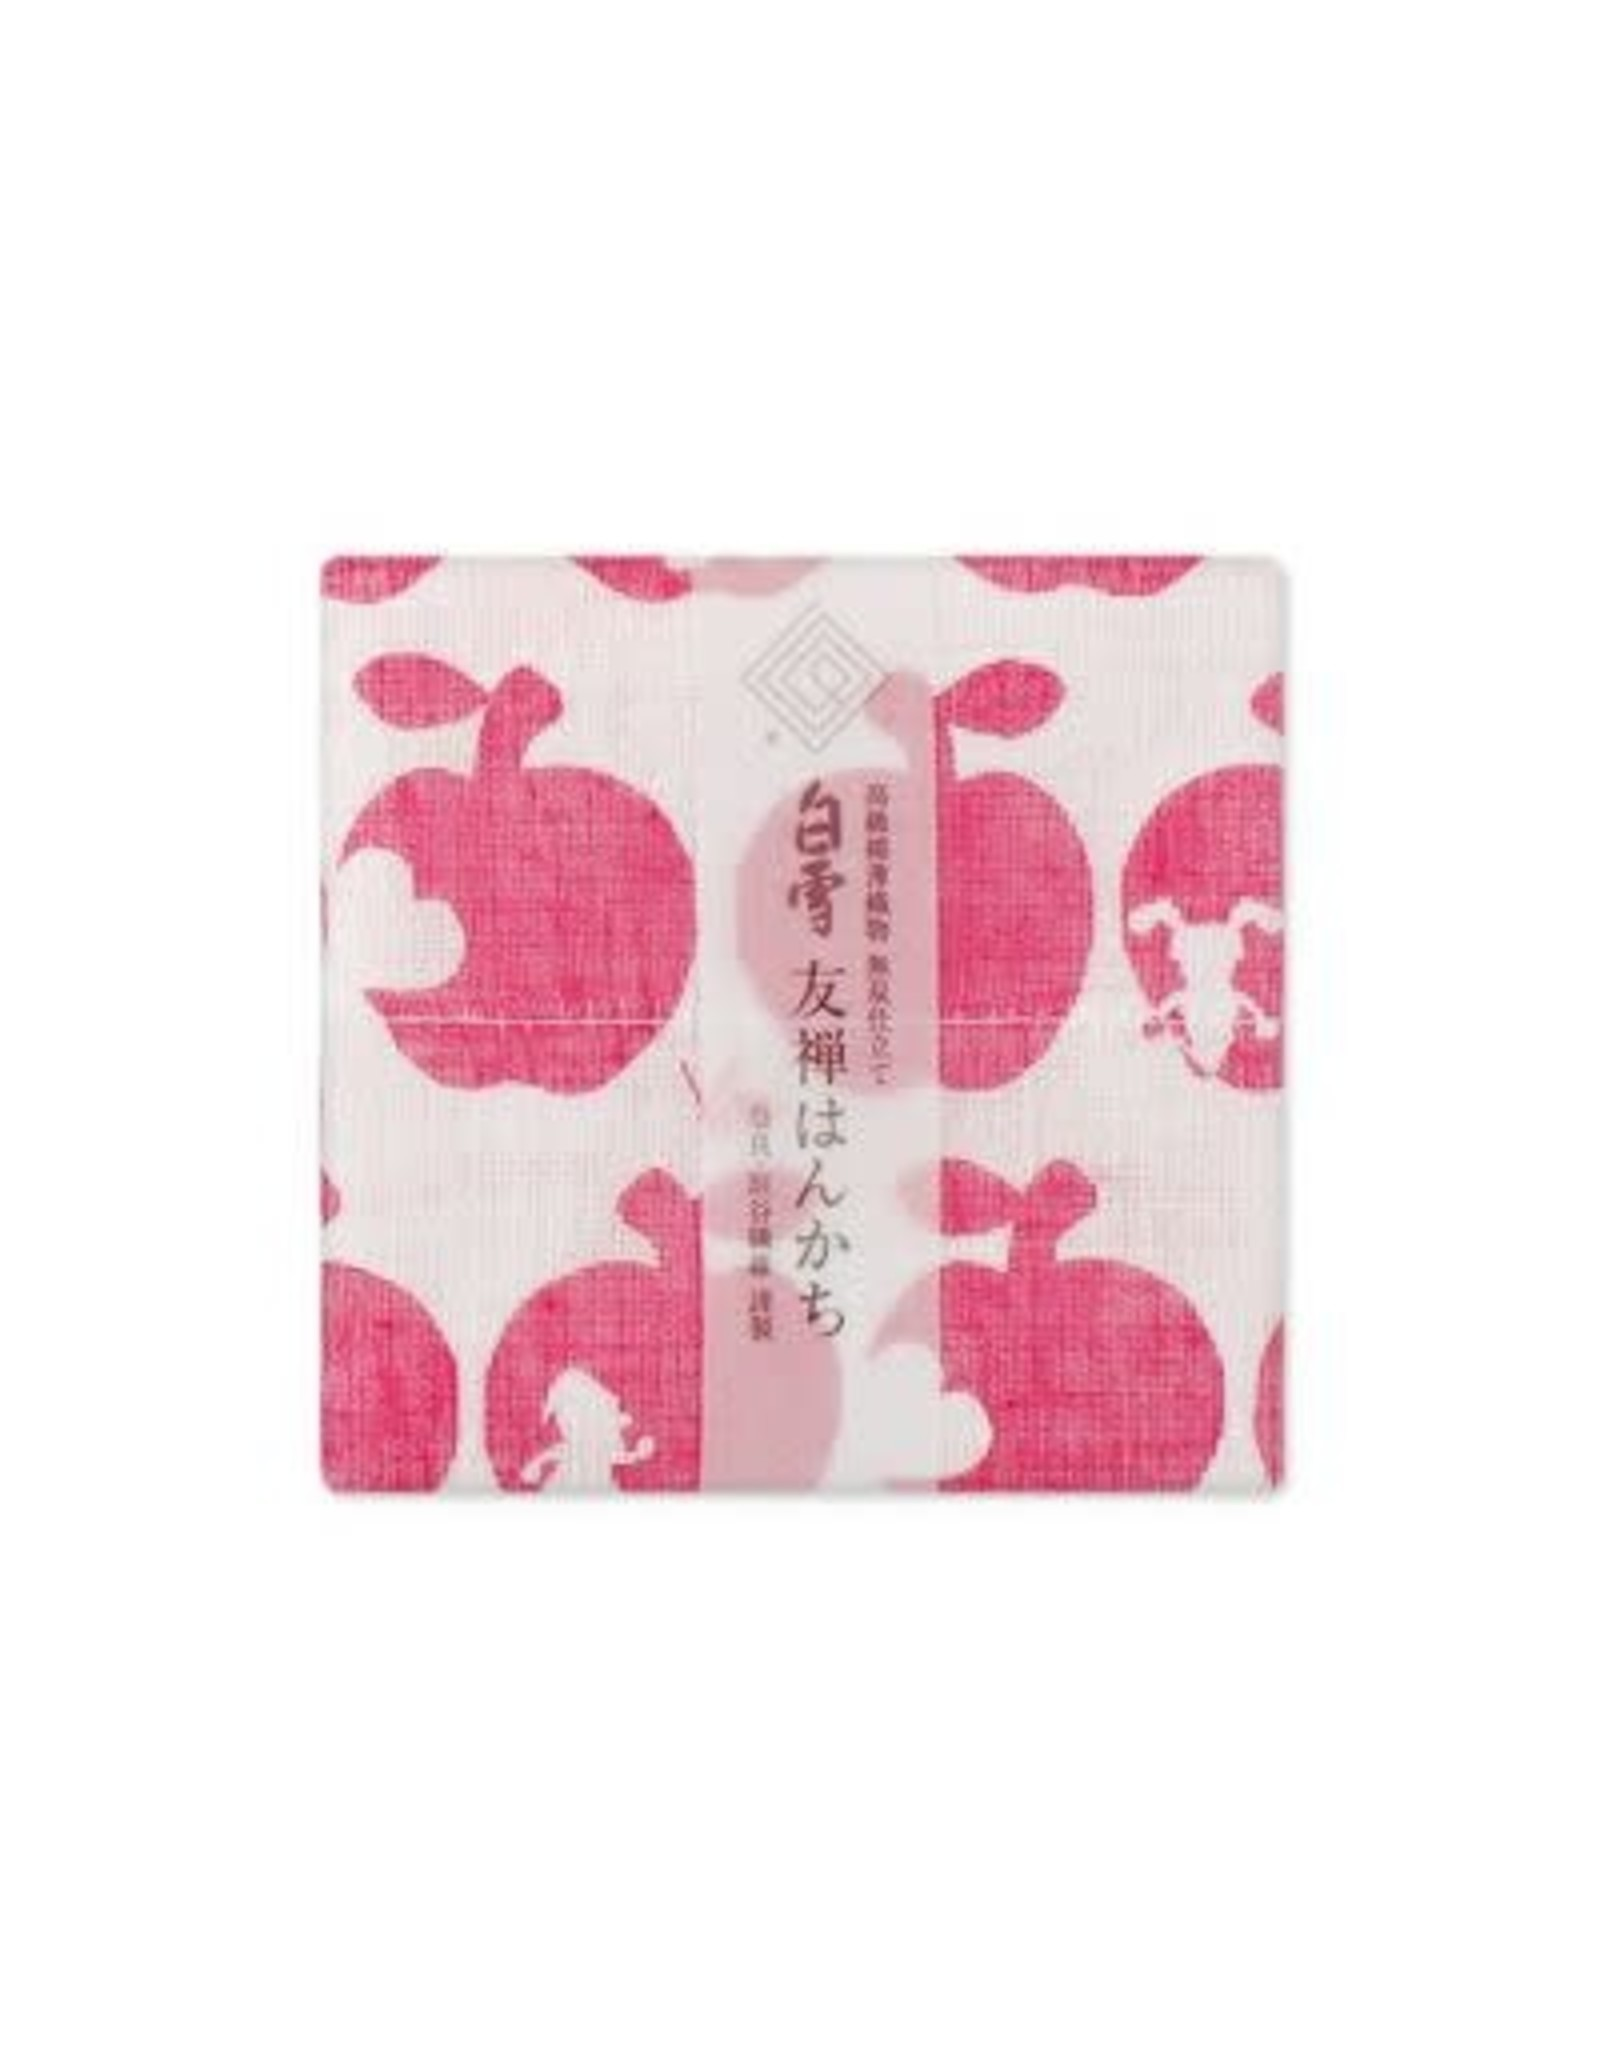 Shirayuki Fukin Co., Ltd. SHIRAYUKI FUKIN HANDKERCHIEF 30cm x 30 cm SHIRAYUKIHIME RED